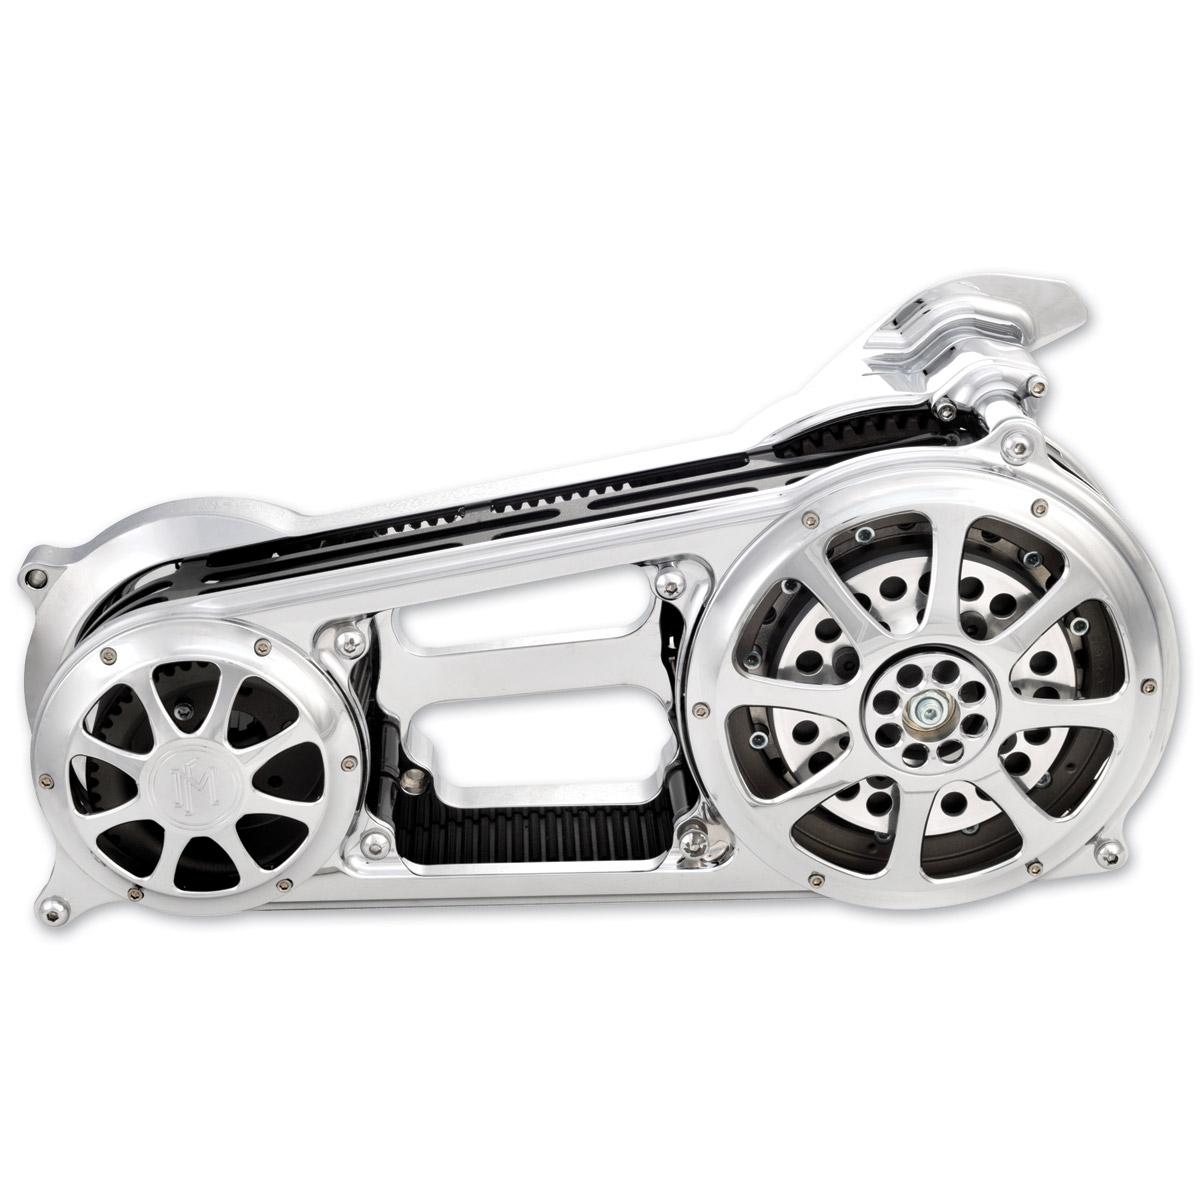 Performance Machine Contour Belt Drive Kit  for Phatail Chrome